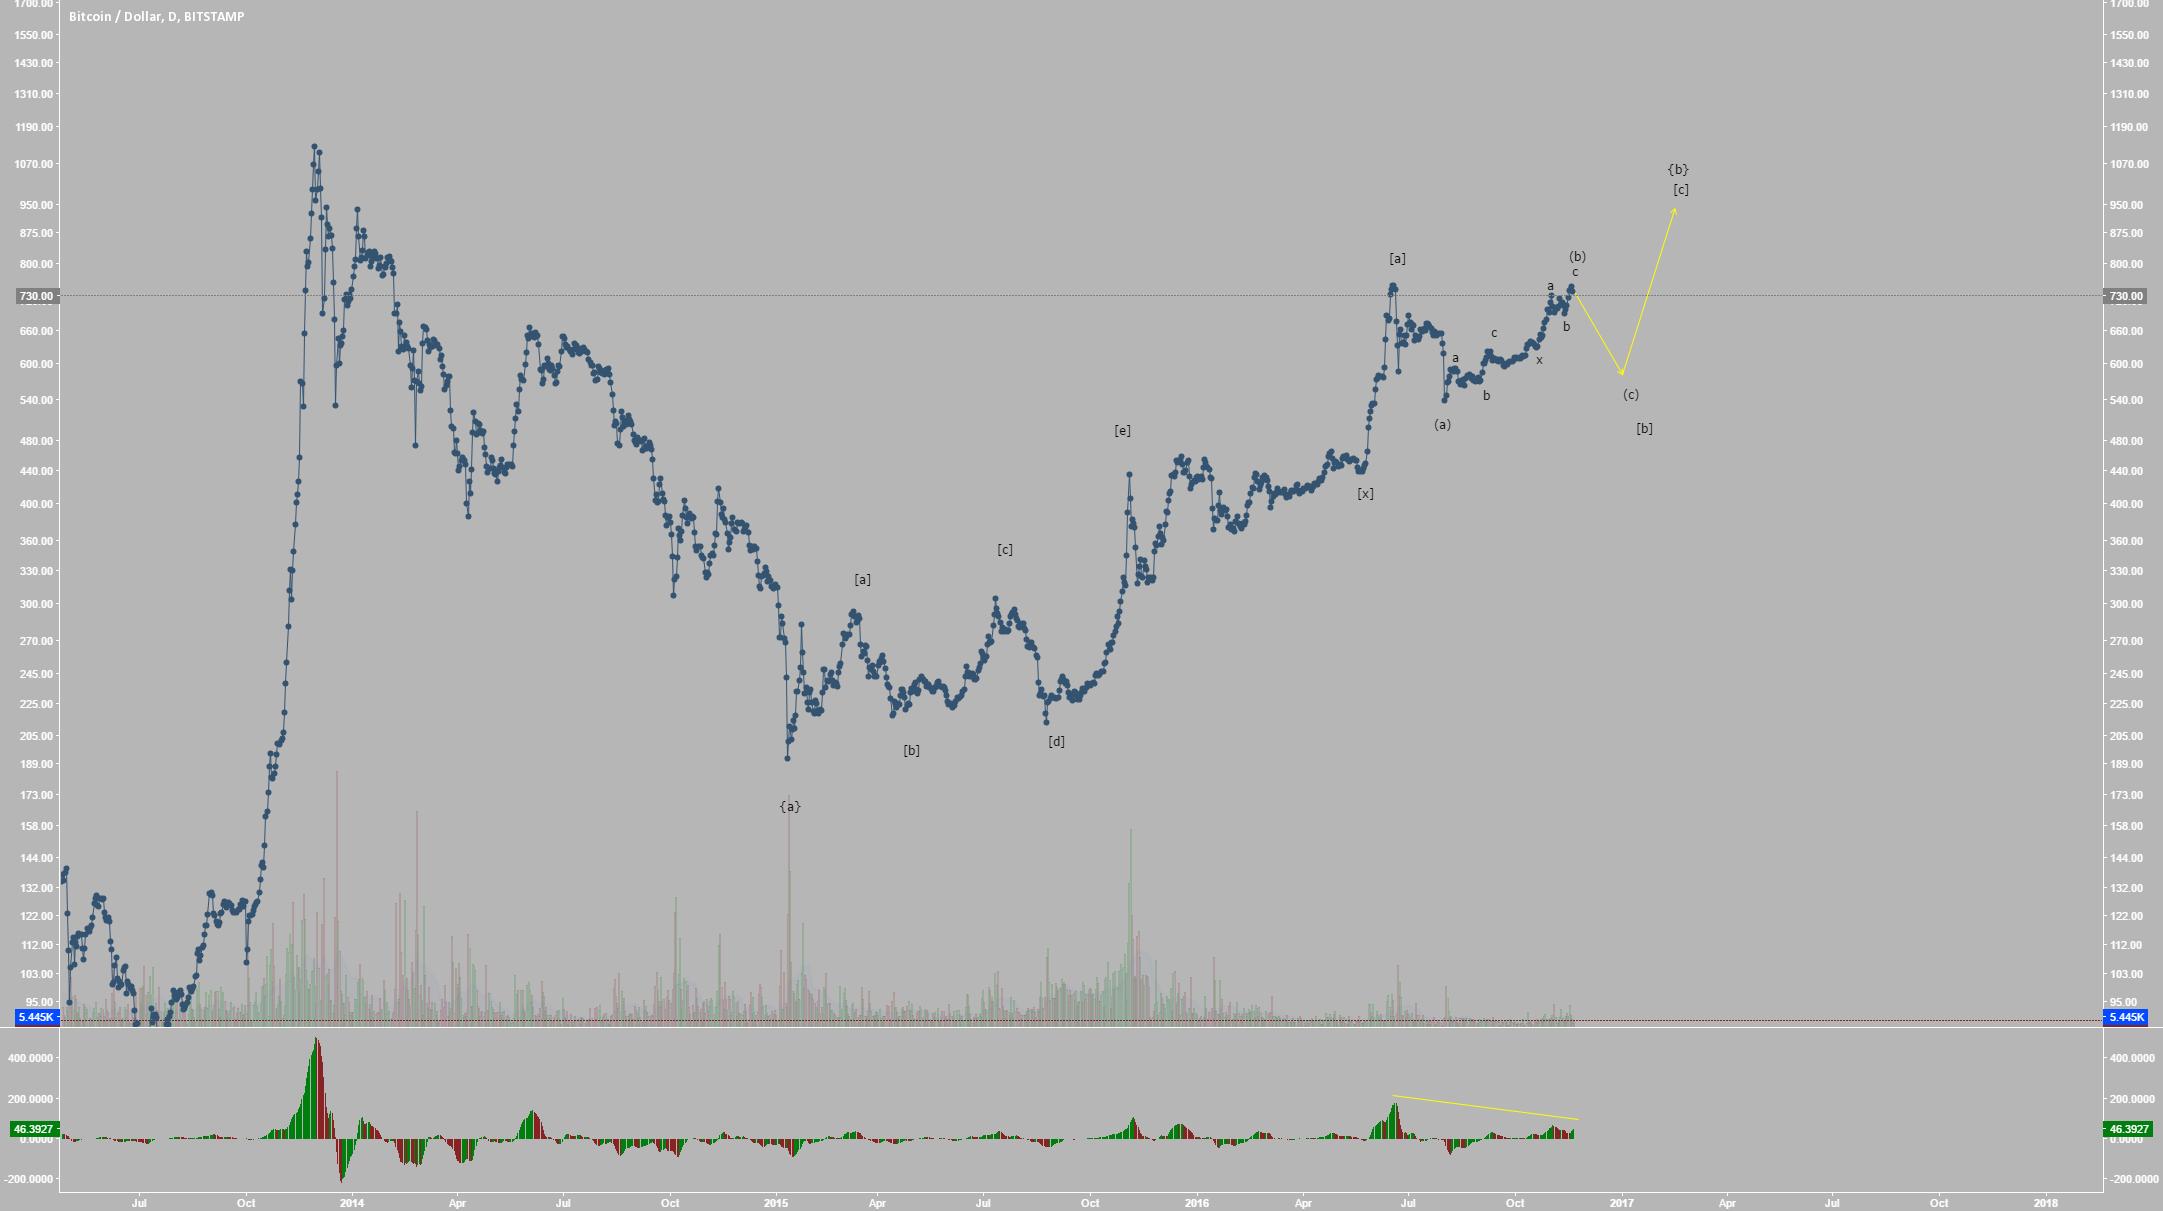 Bitcoin Preparing for Deep Retracement to Sub-600 (Elliott Wave)